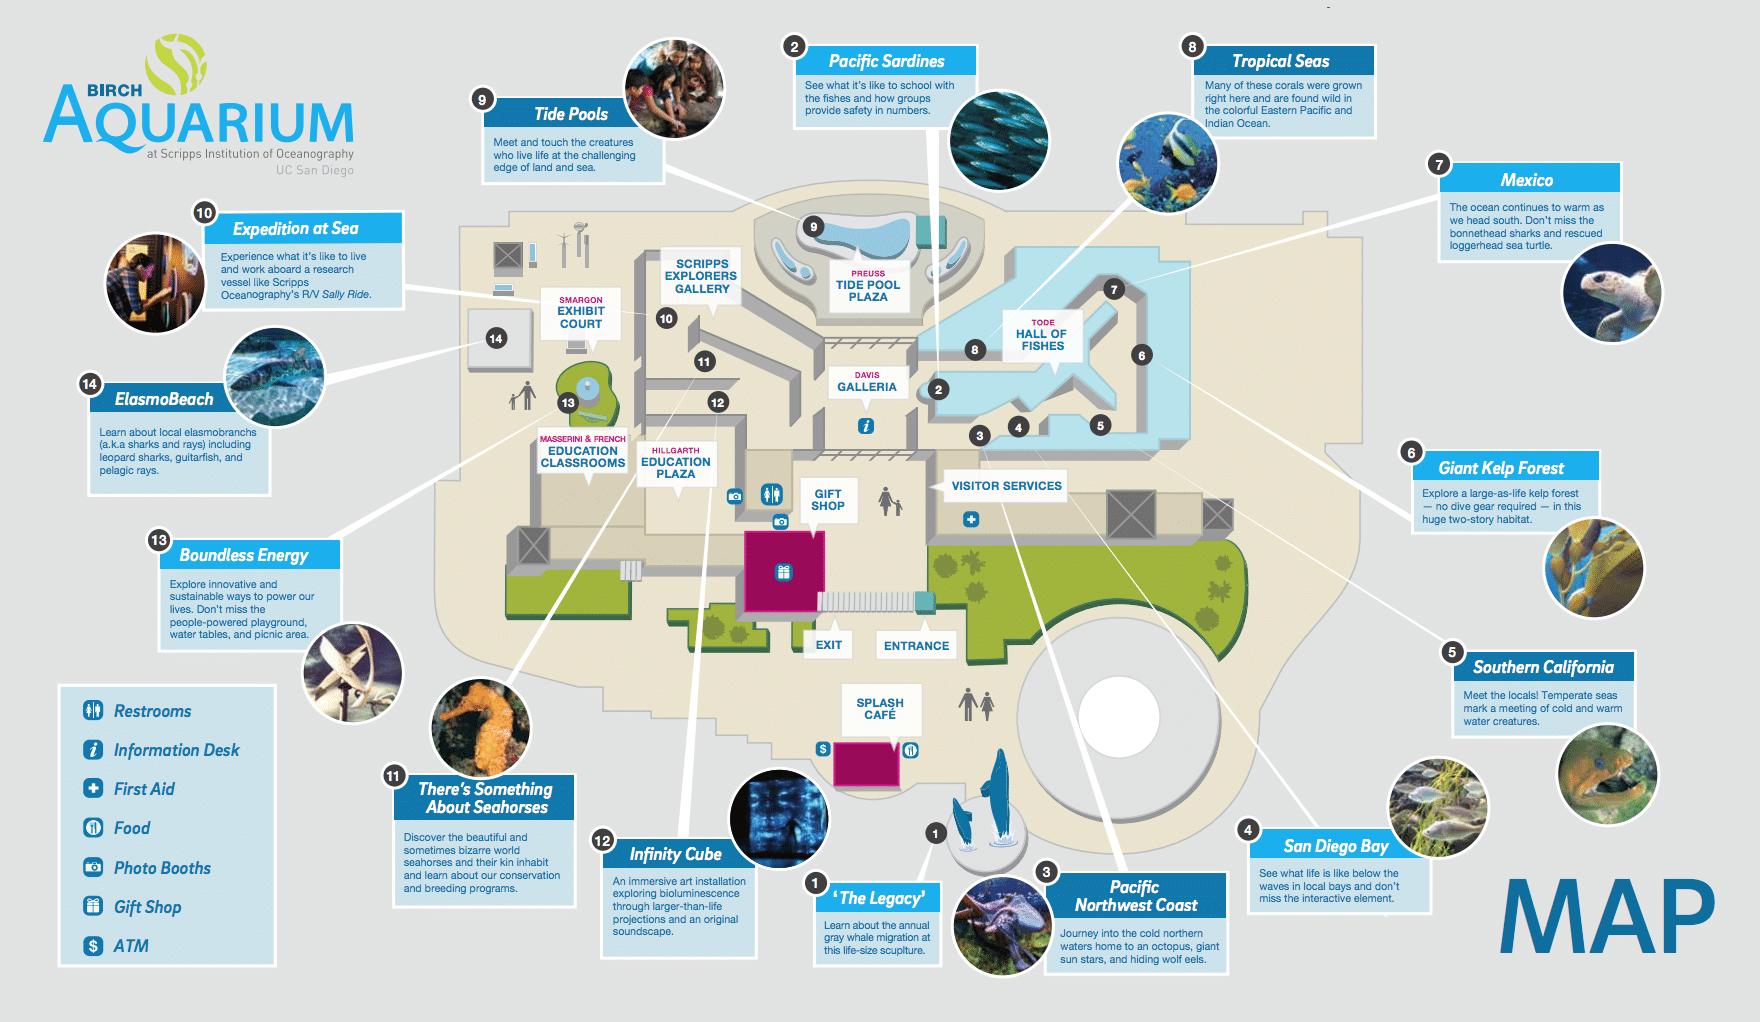 Birch Aquarium La Jolla Map